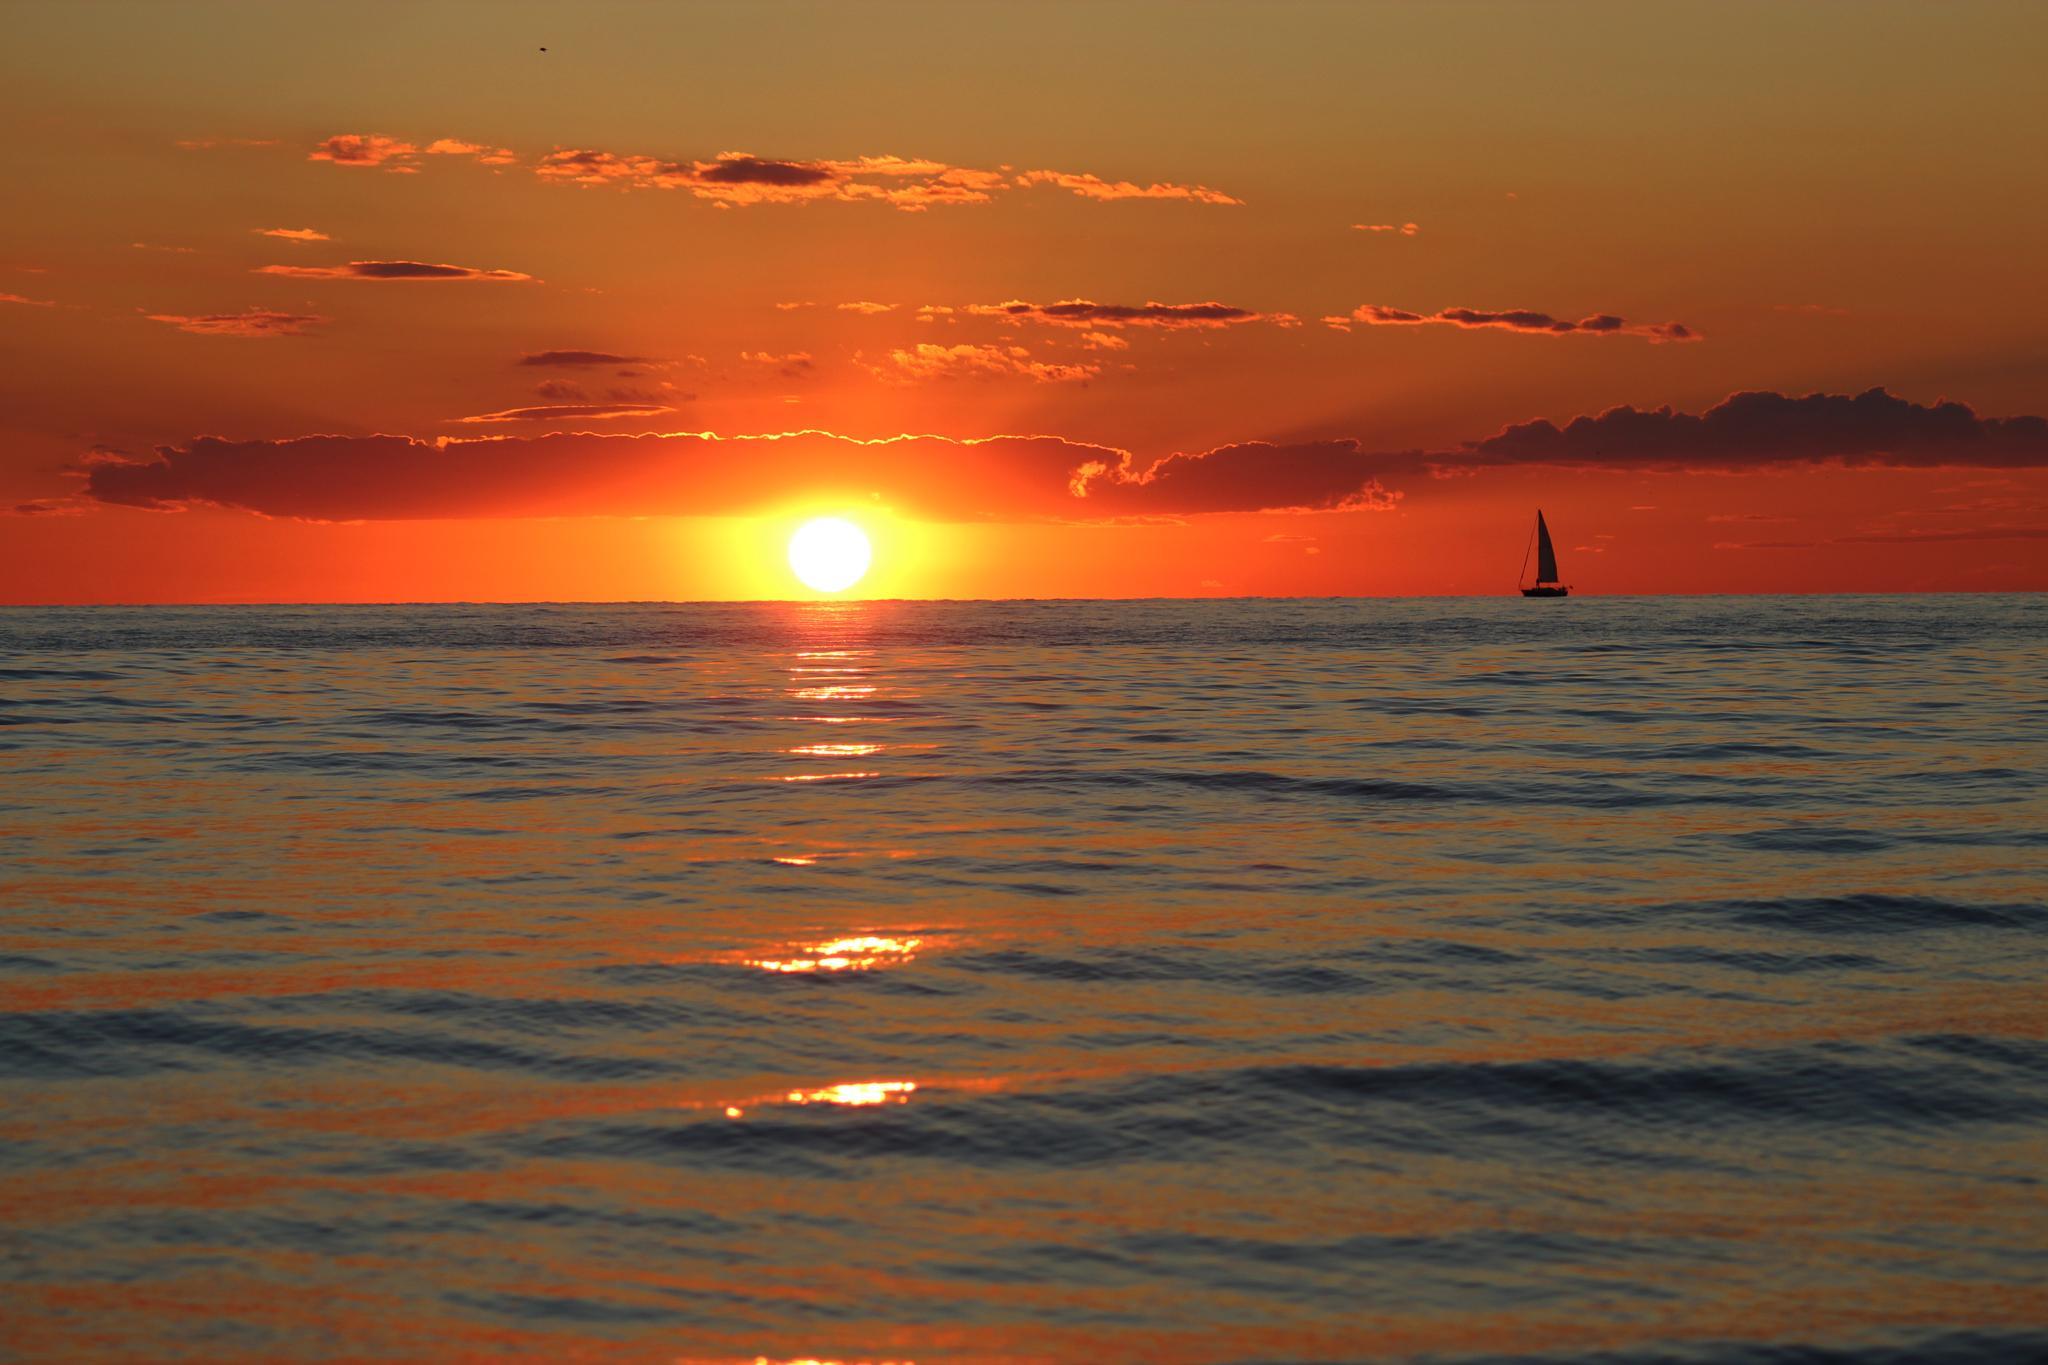 Lake Michigan sunset by Nicole Derrickson